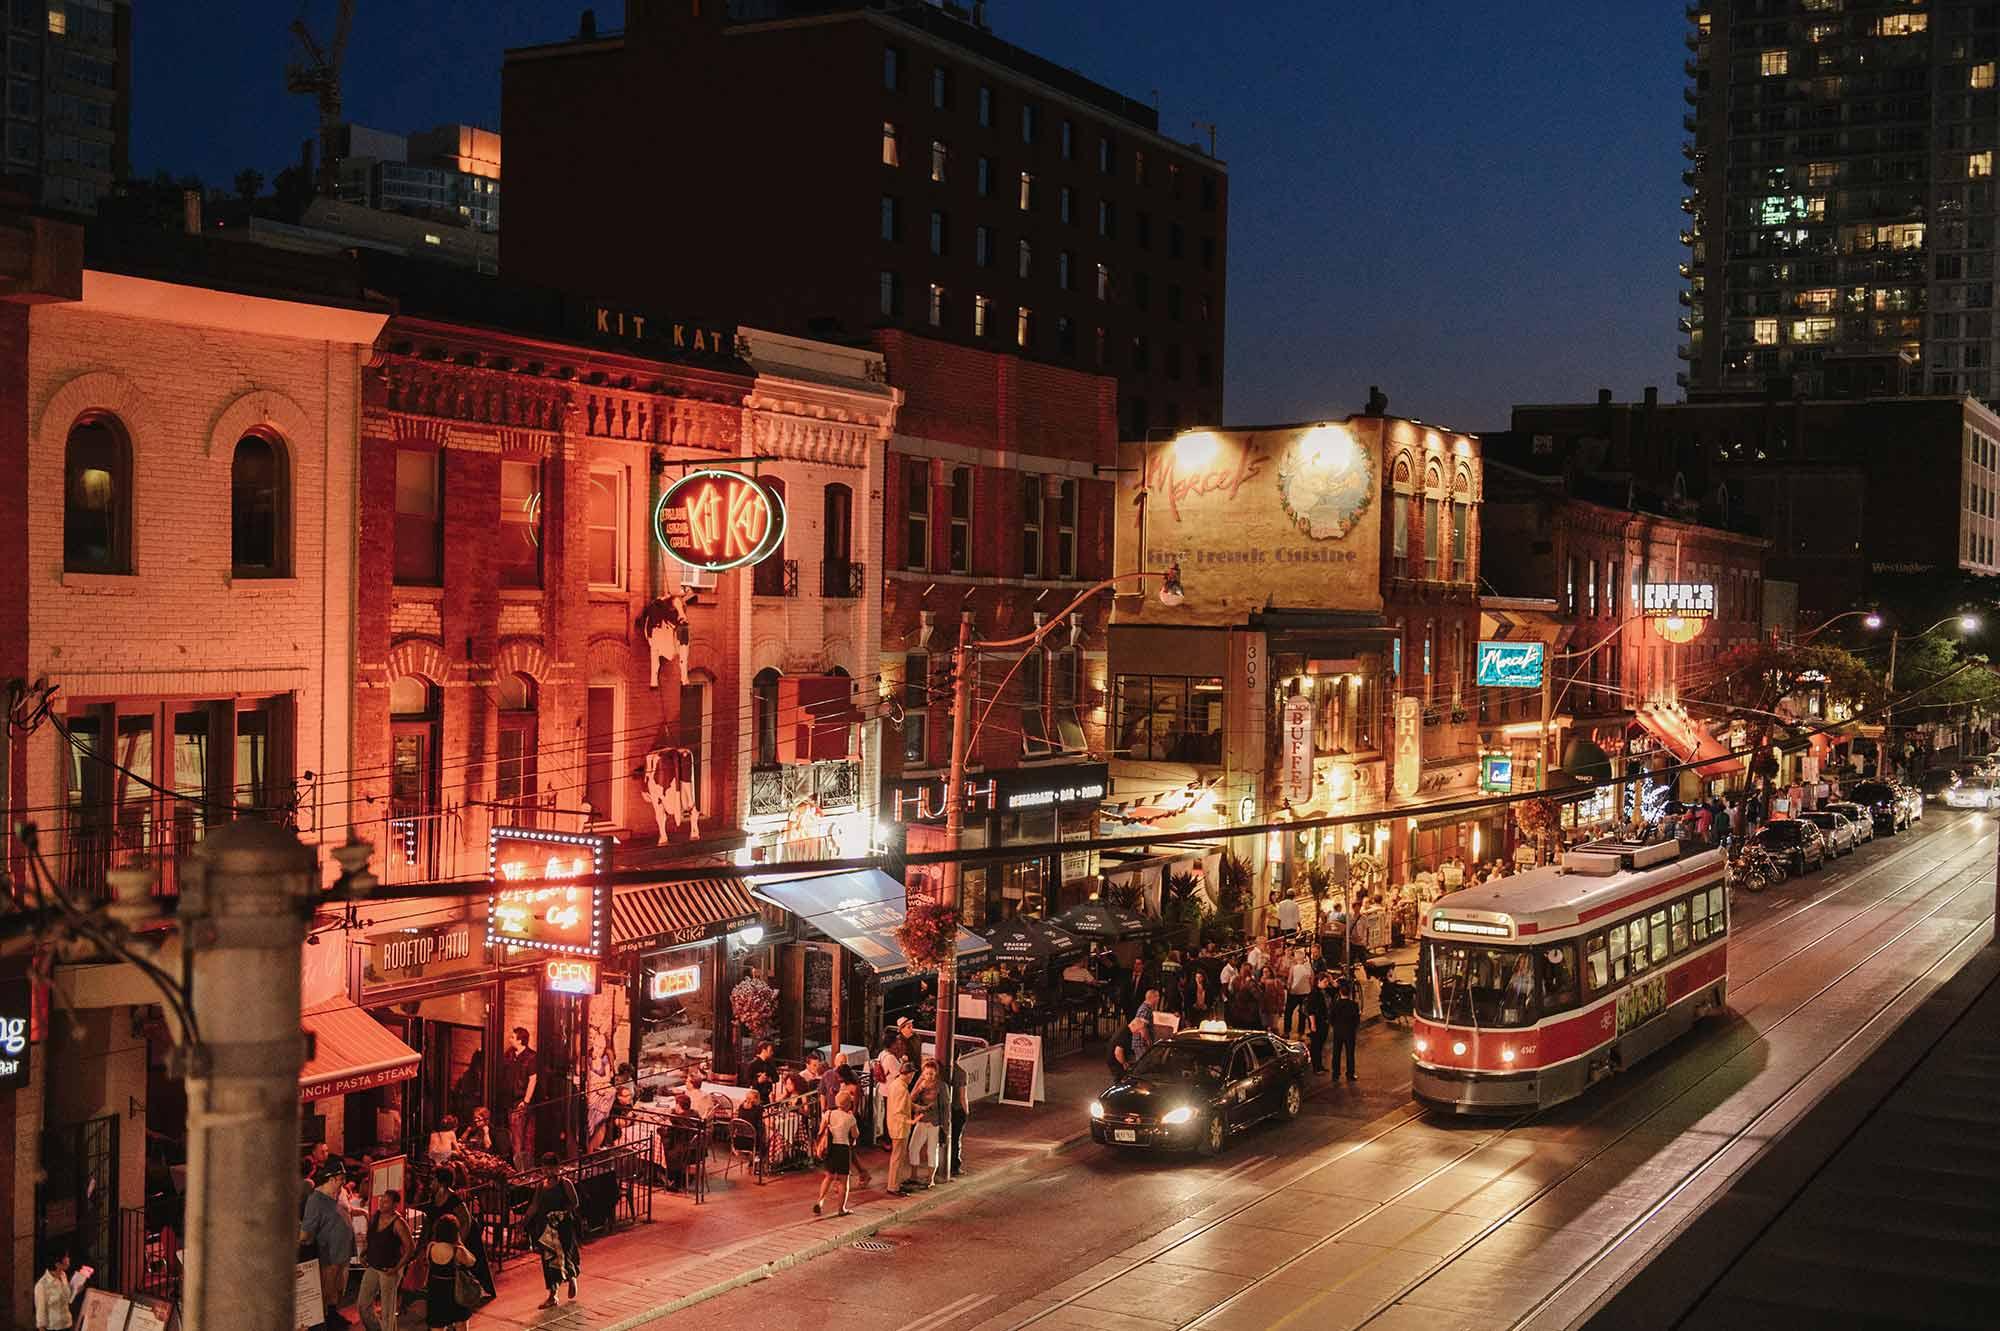 Entertainment District South, Toronto